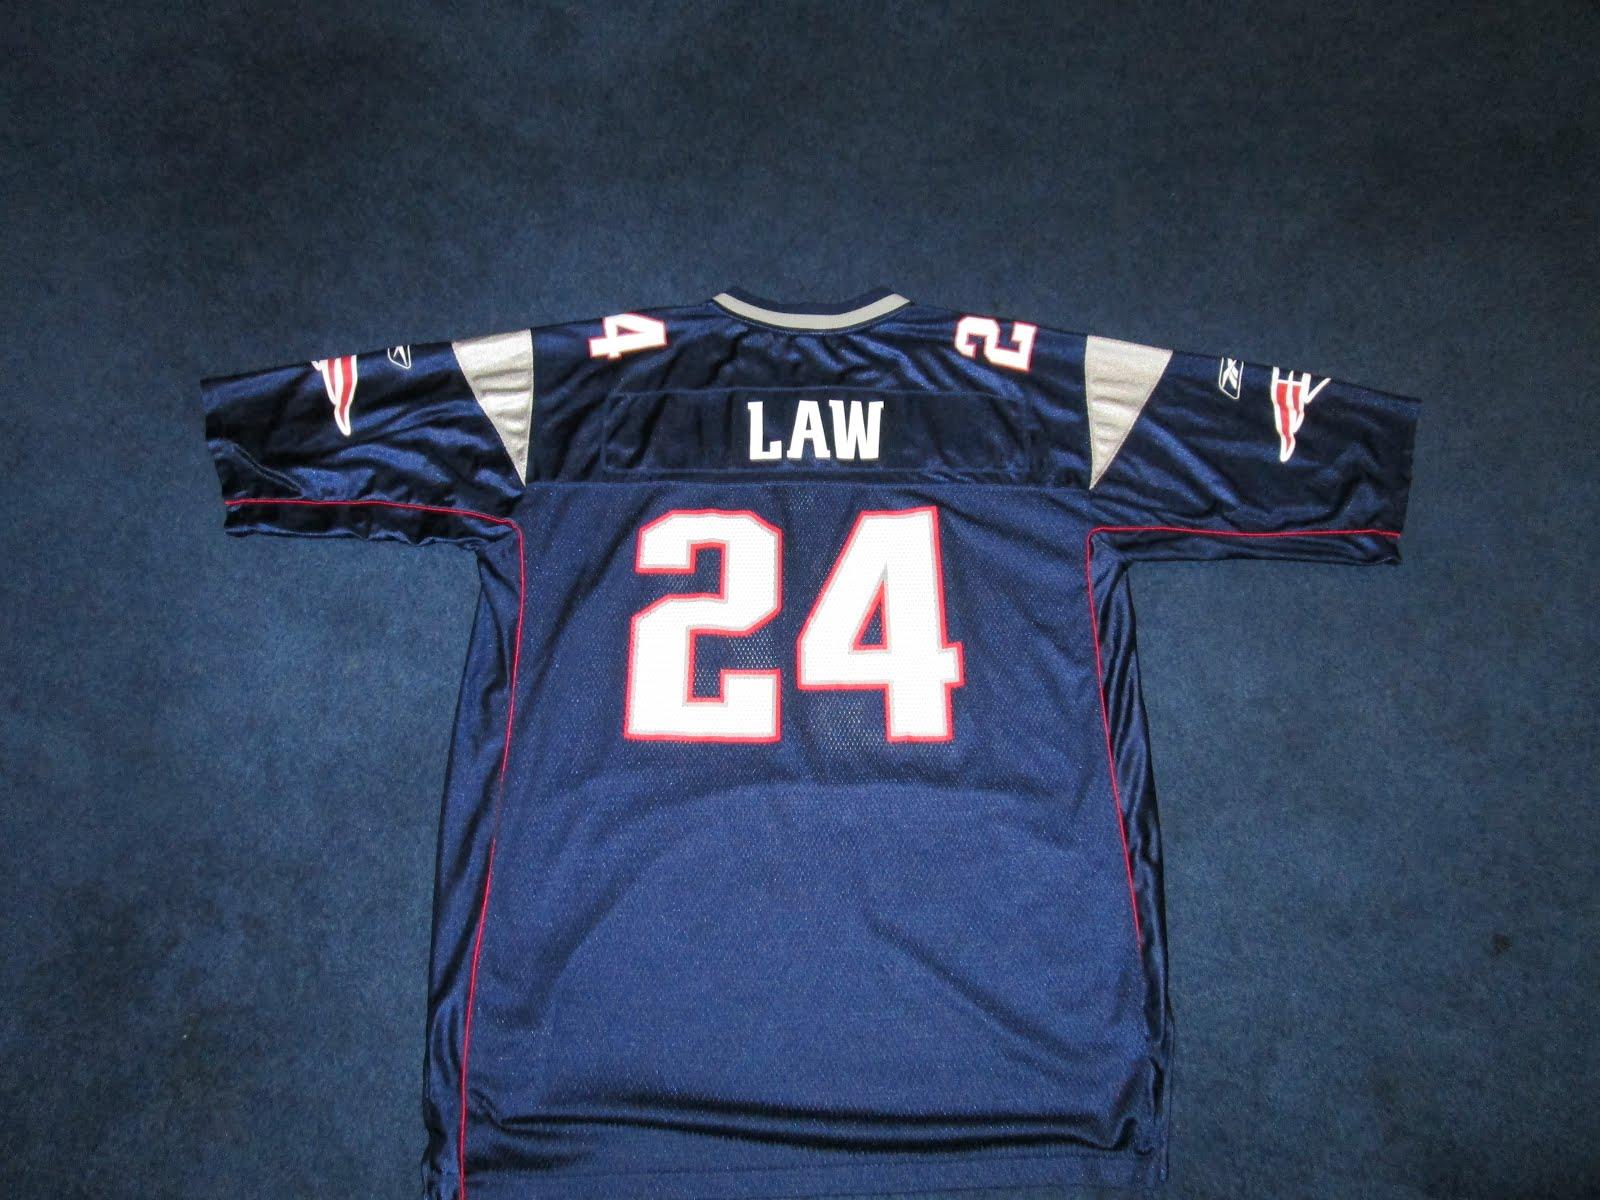 b93afe63e6c ... Vintage Reebok Ty Law 24 New England Patriots Jersey ...